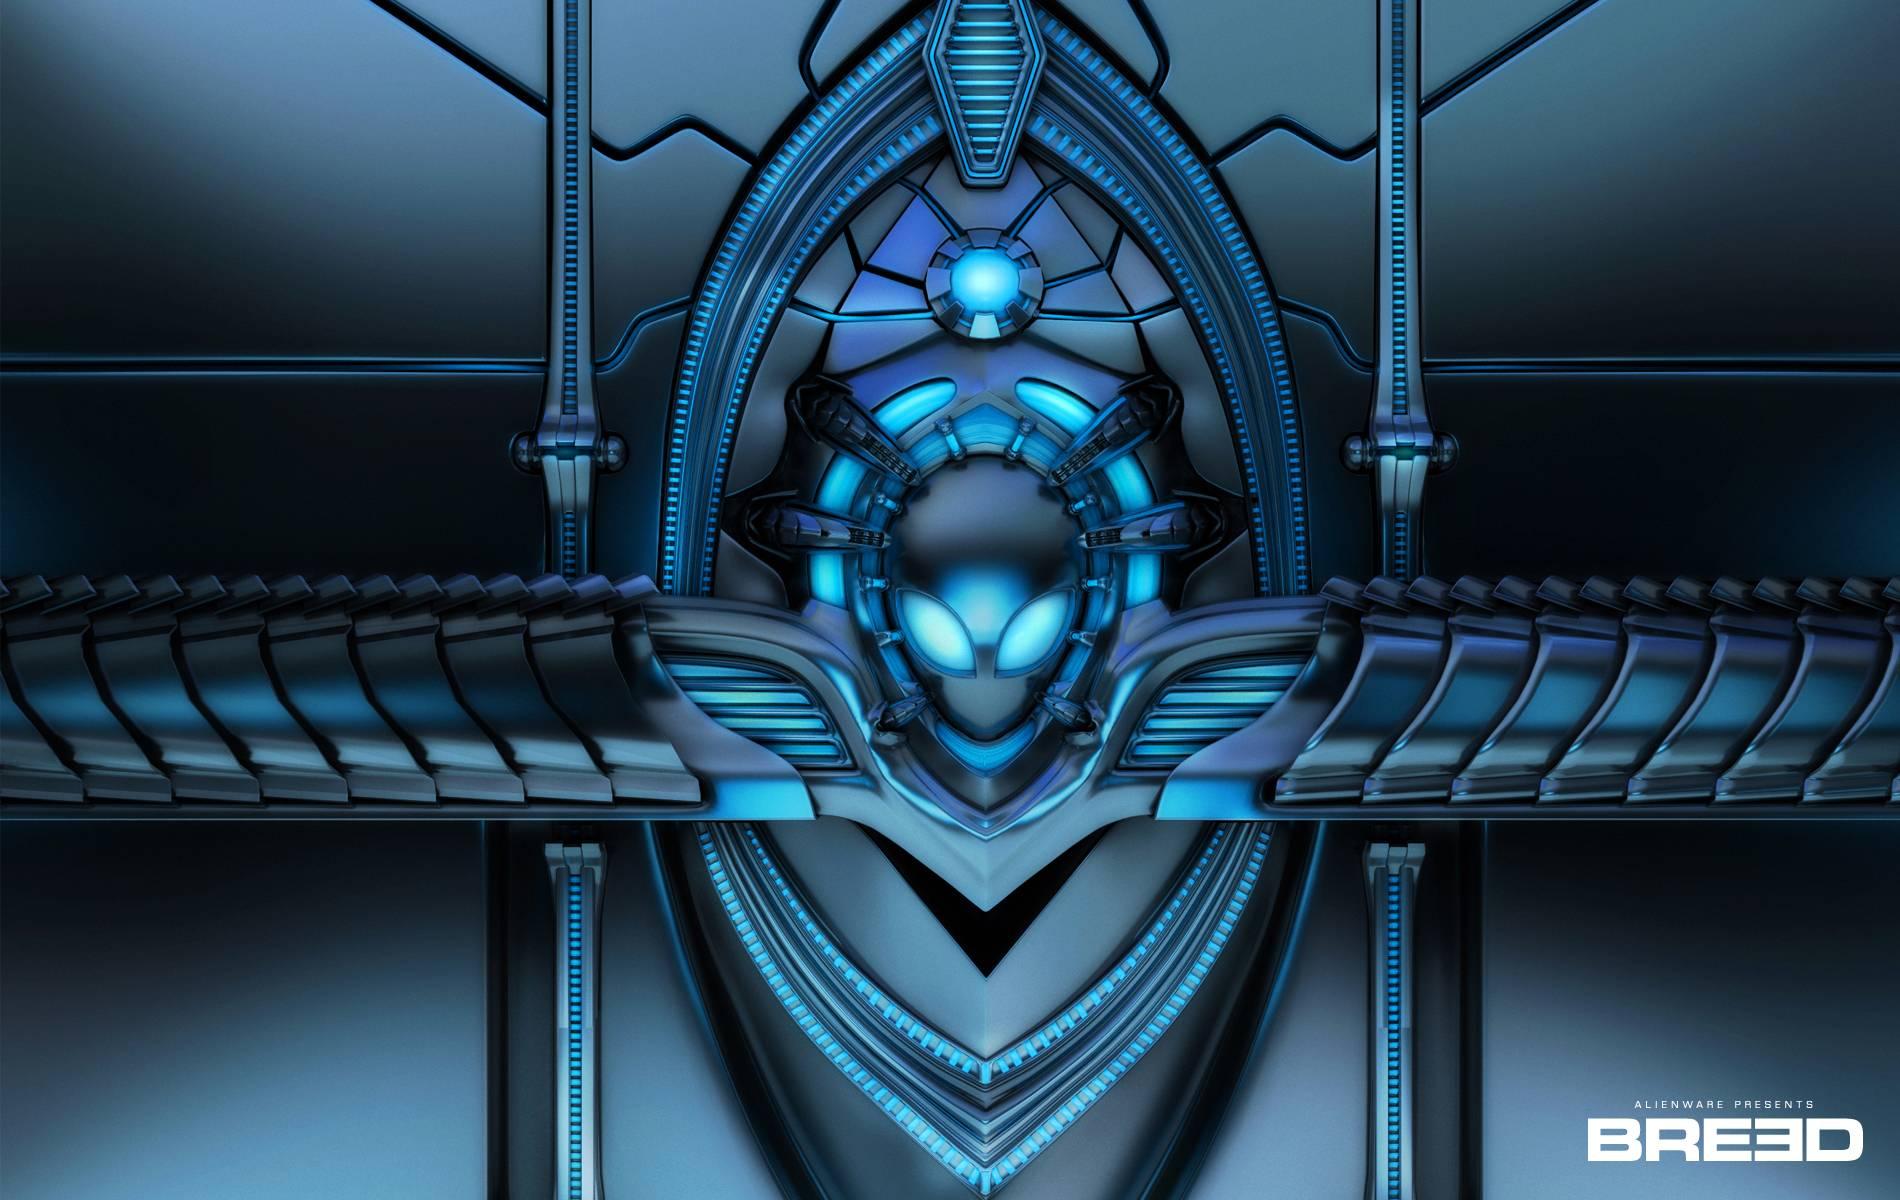 Atemberaubend Alienware Wallpapers HD - Wallpaper Cave &AB_52